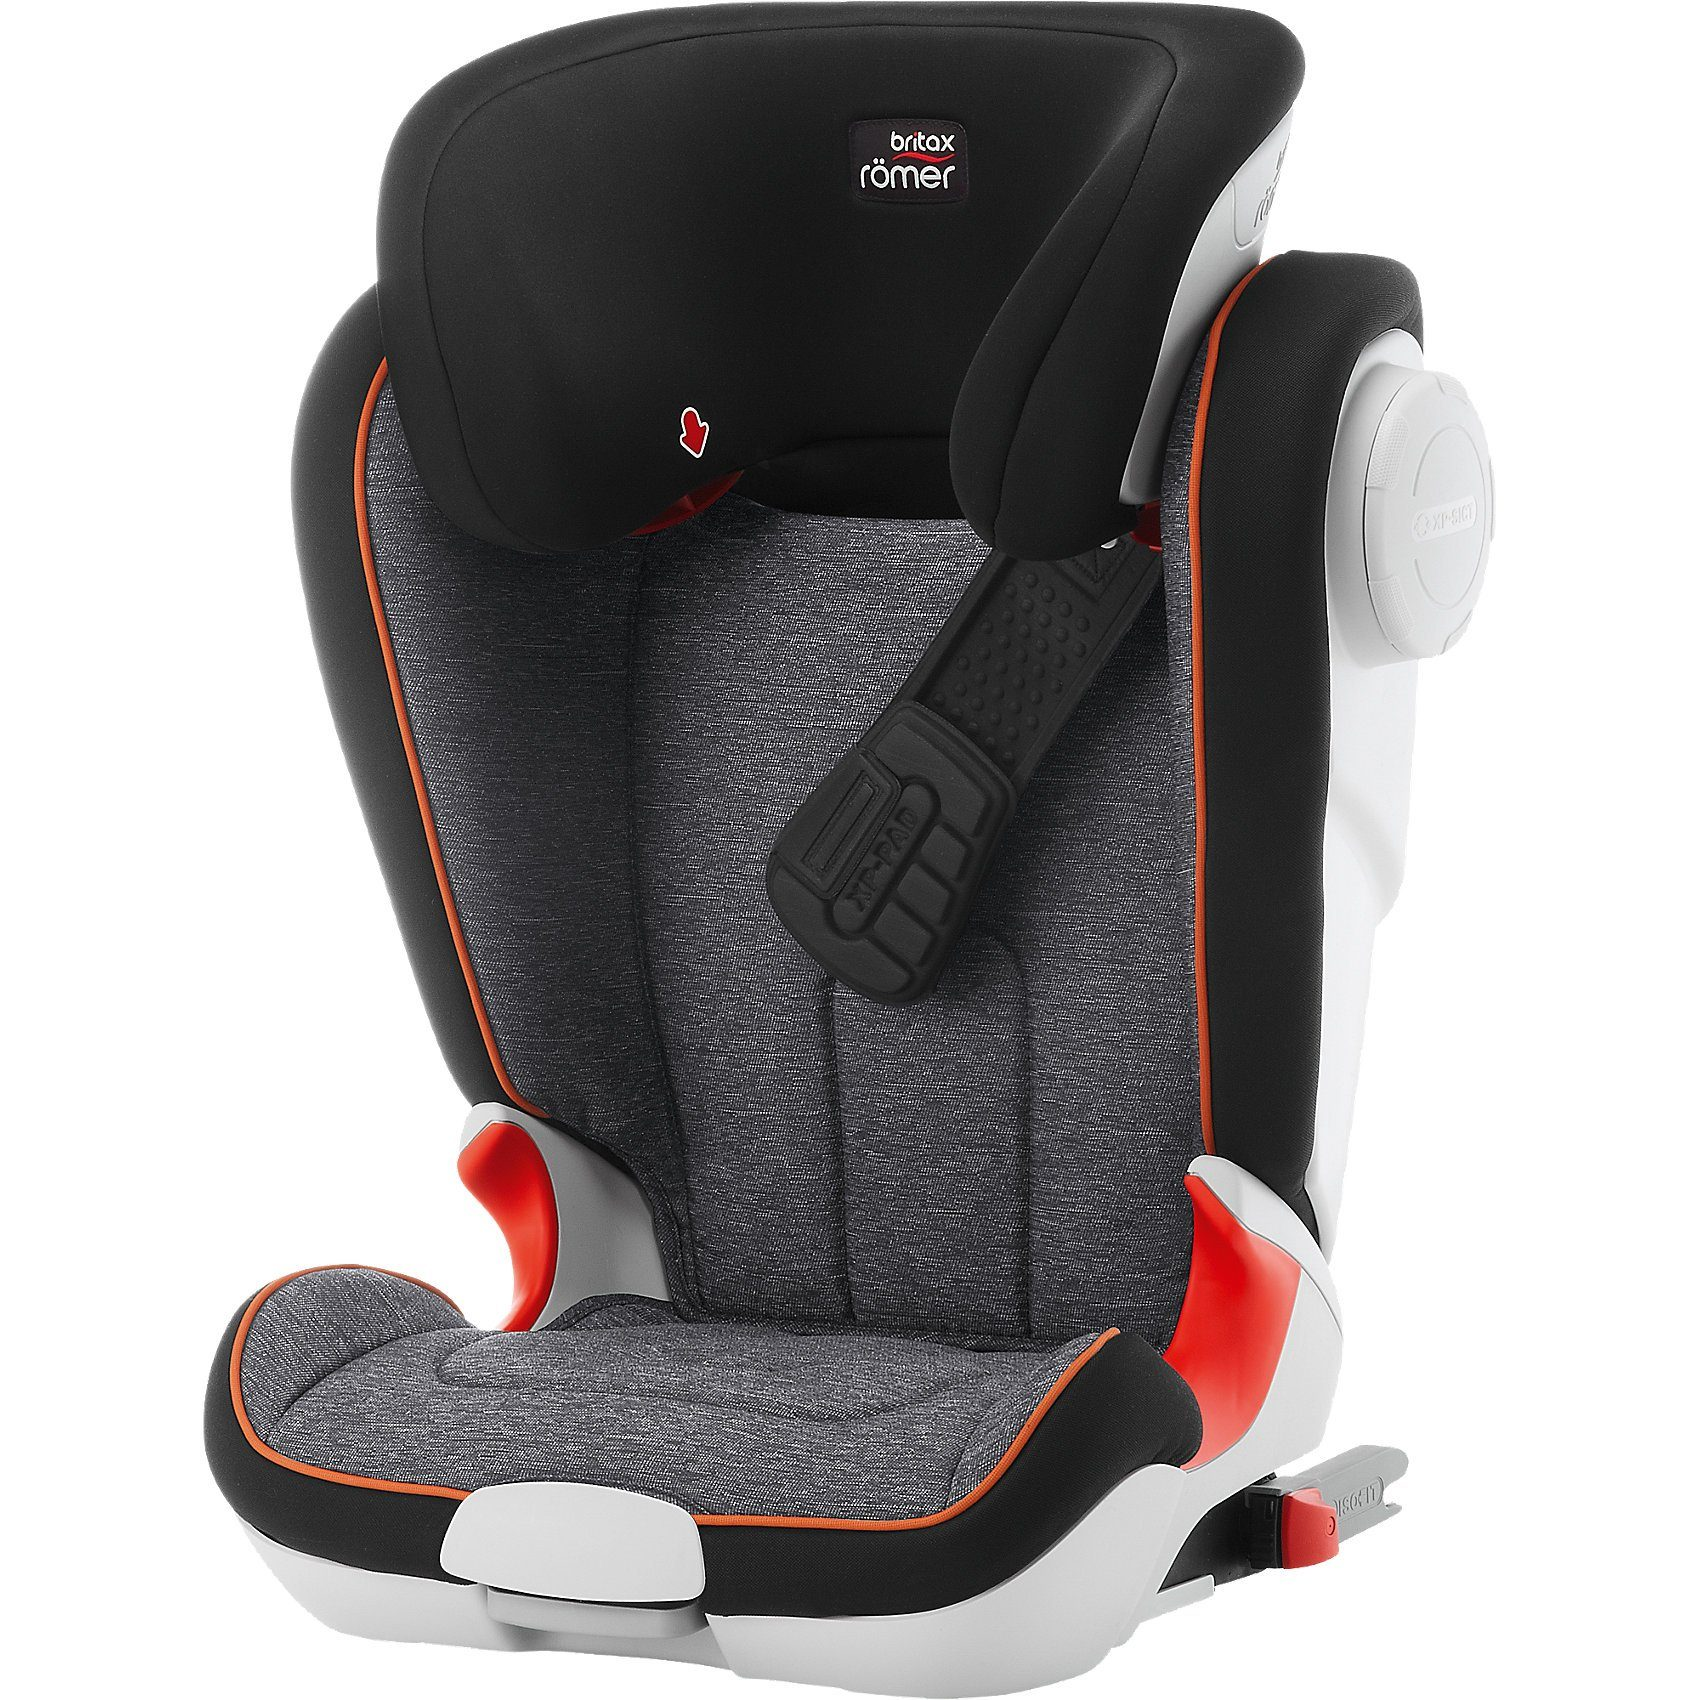 Britax Römer Auto-Kindersitz Kidfix XP Sict, Black Marble, 2018